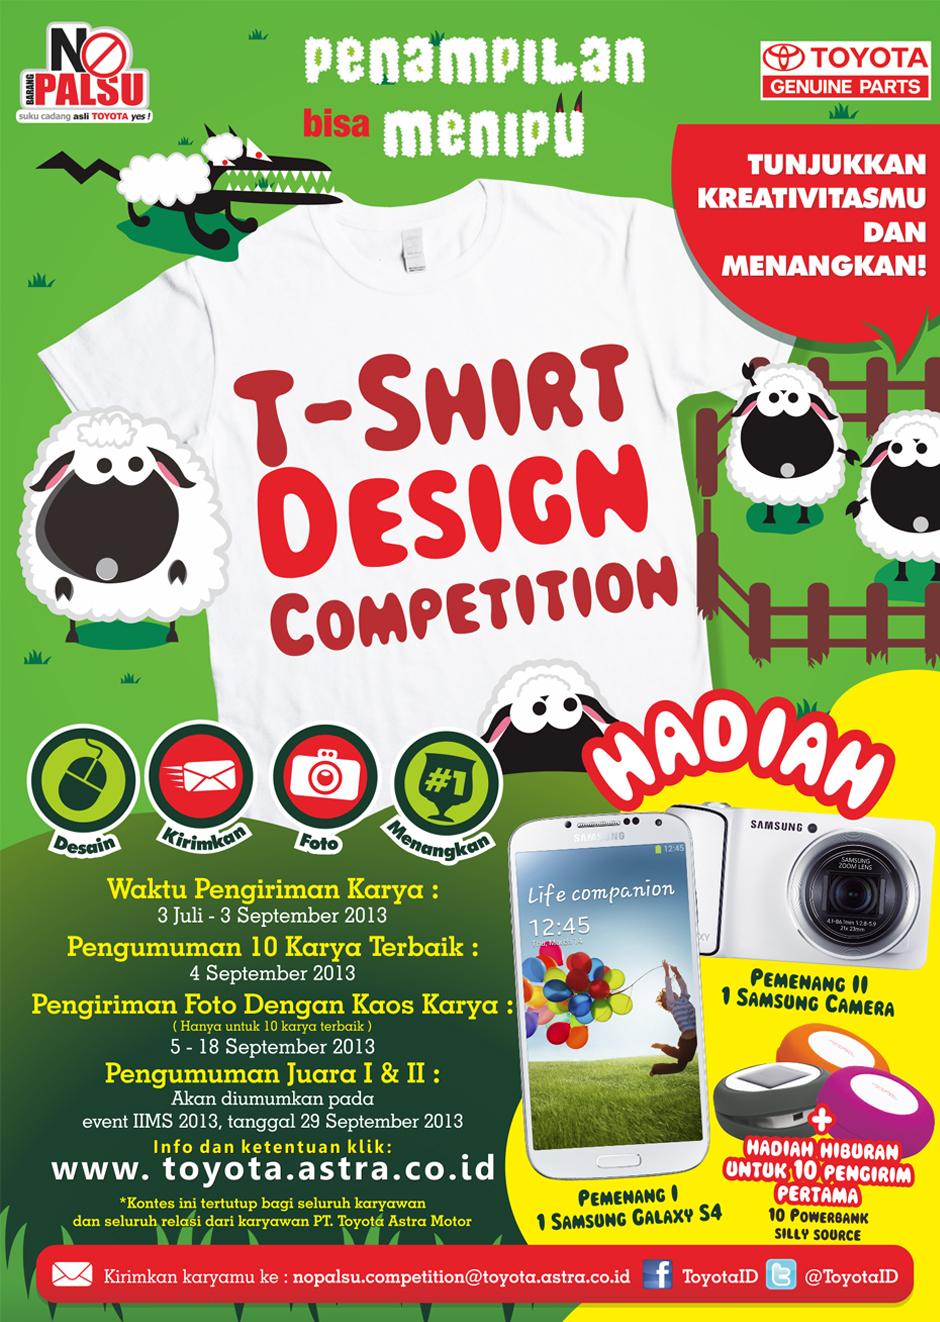 Kompetisi Design T-Shirt No Palsu